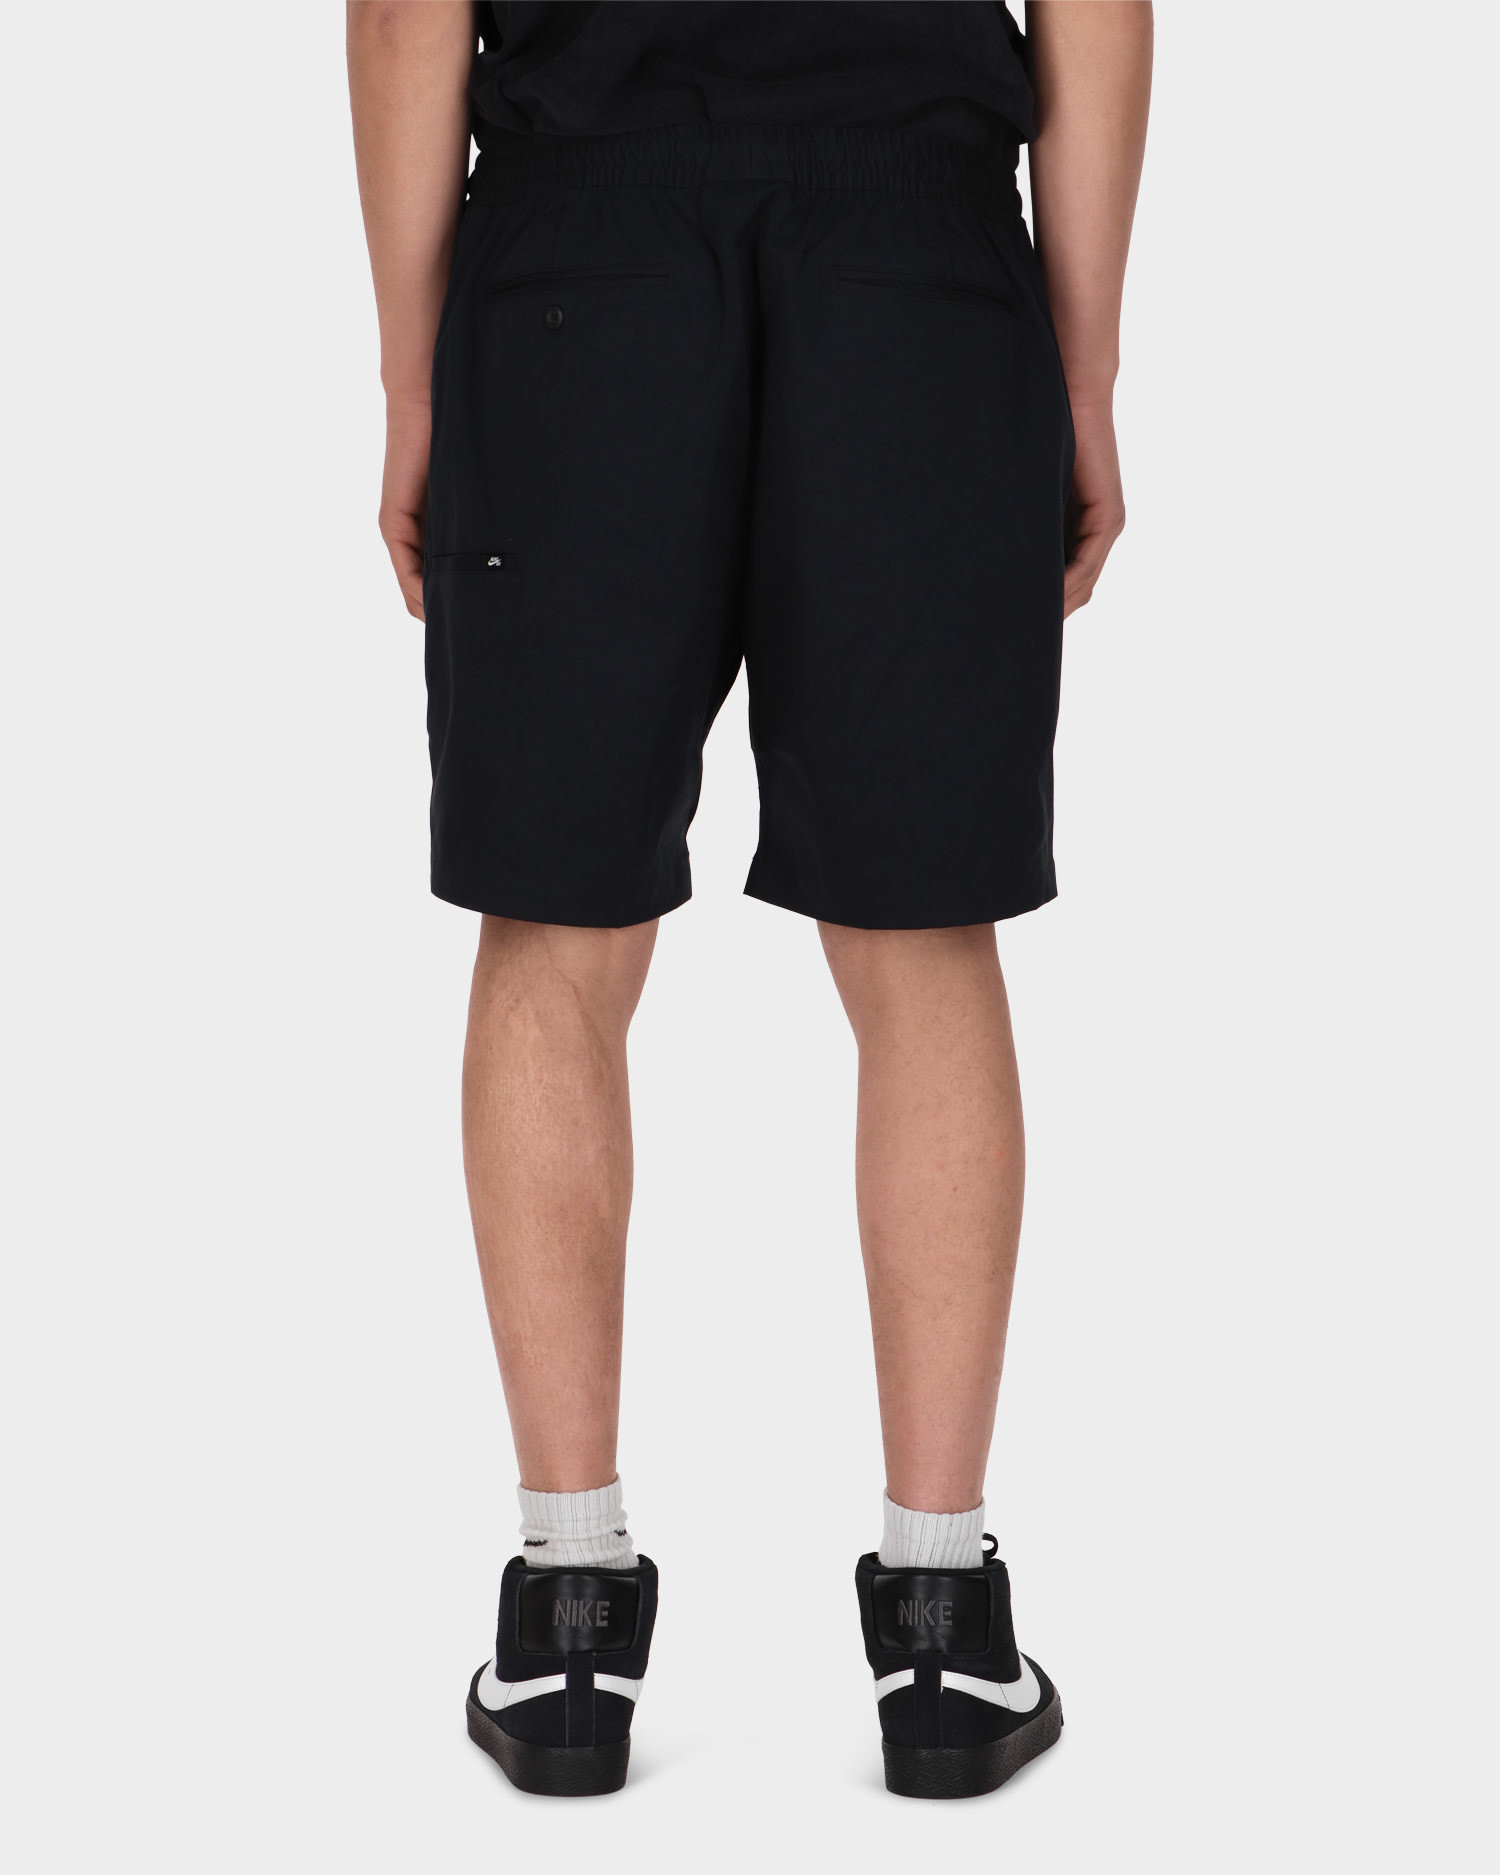 Nike SB Pull On Chino Shorts Grey